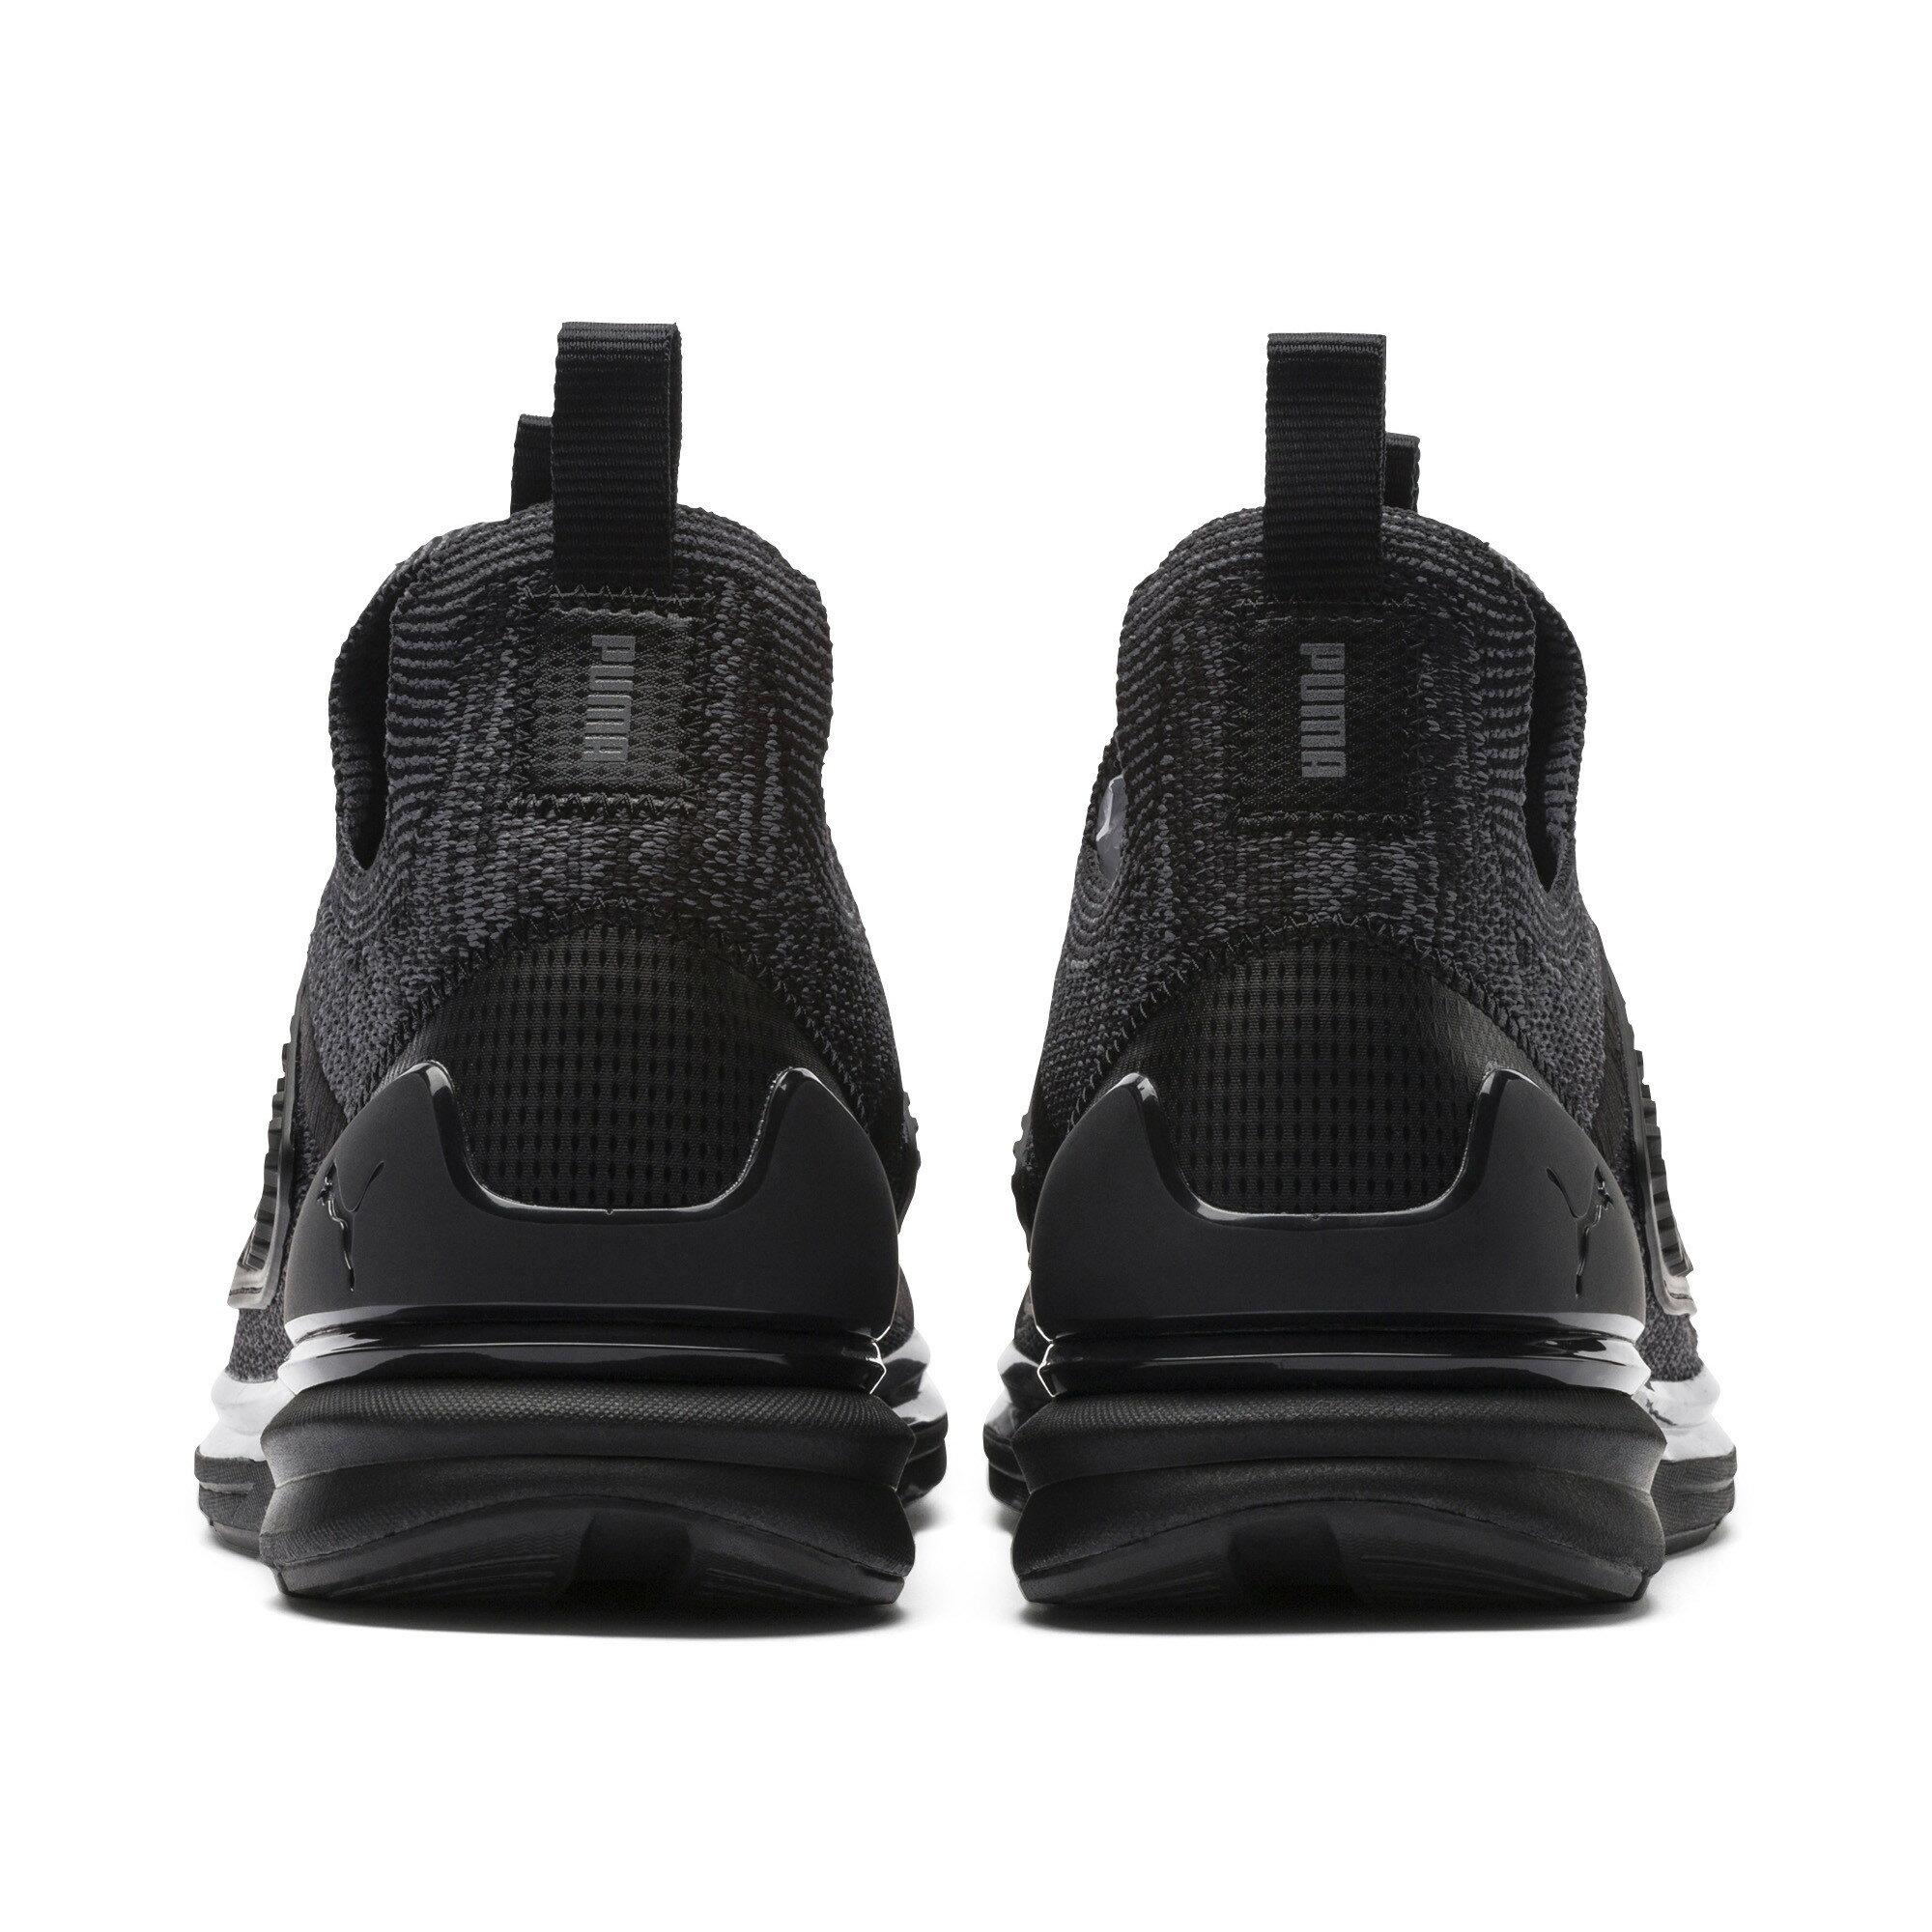 Official Puma Store  PUMA IGNITE Limitless 2 evoKNIT Sneakers ... 6064cb283